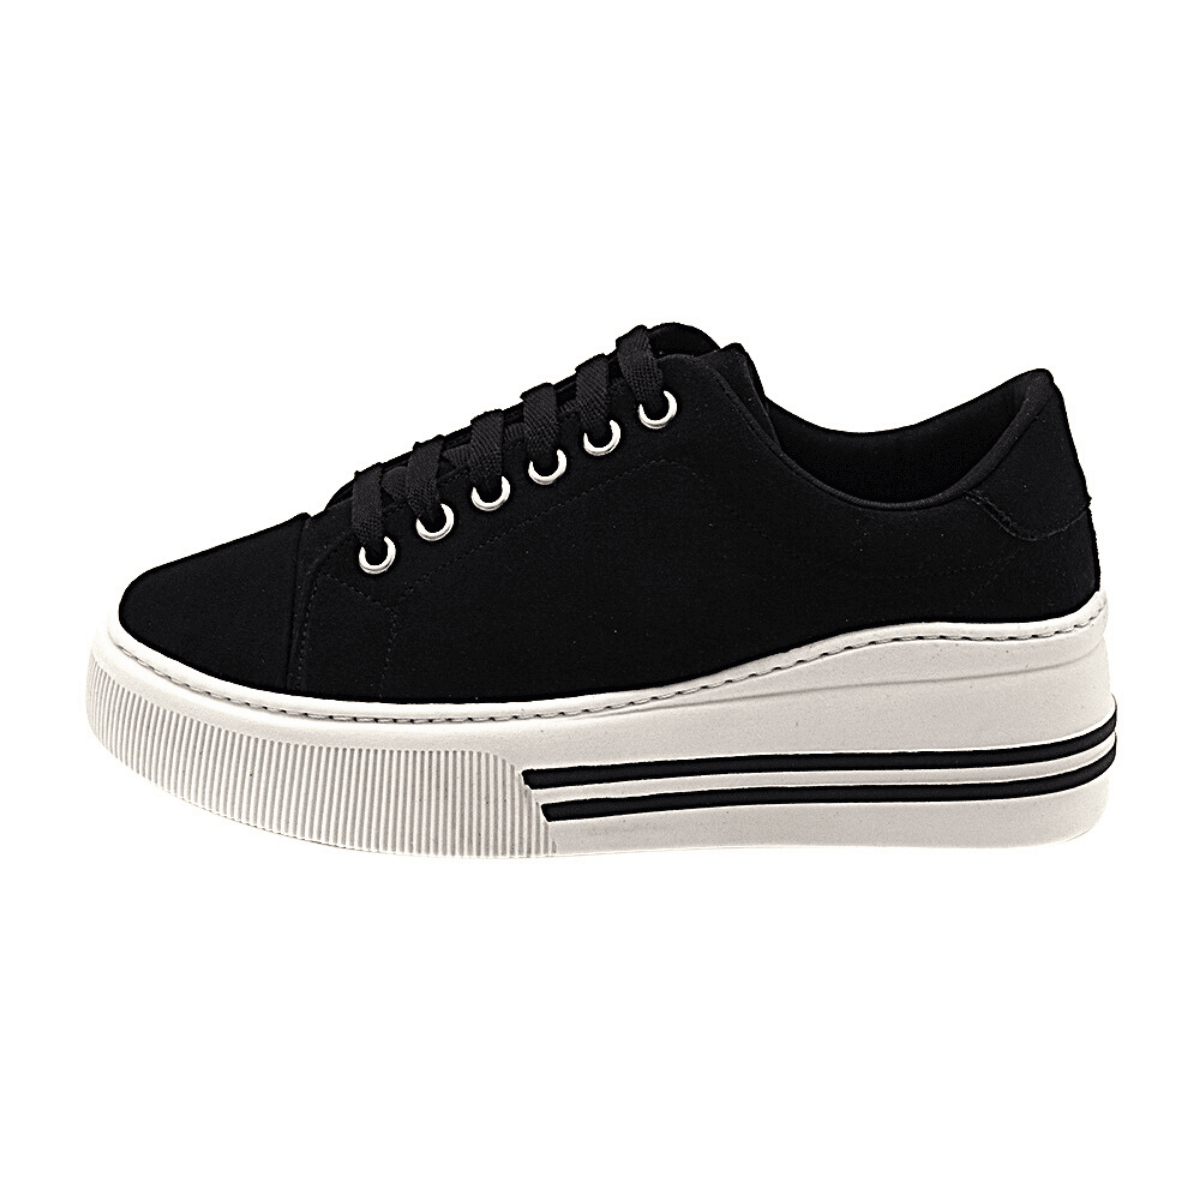 Tênis Casual Feminino Gommix Shoes 196 Sola Alta Preto